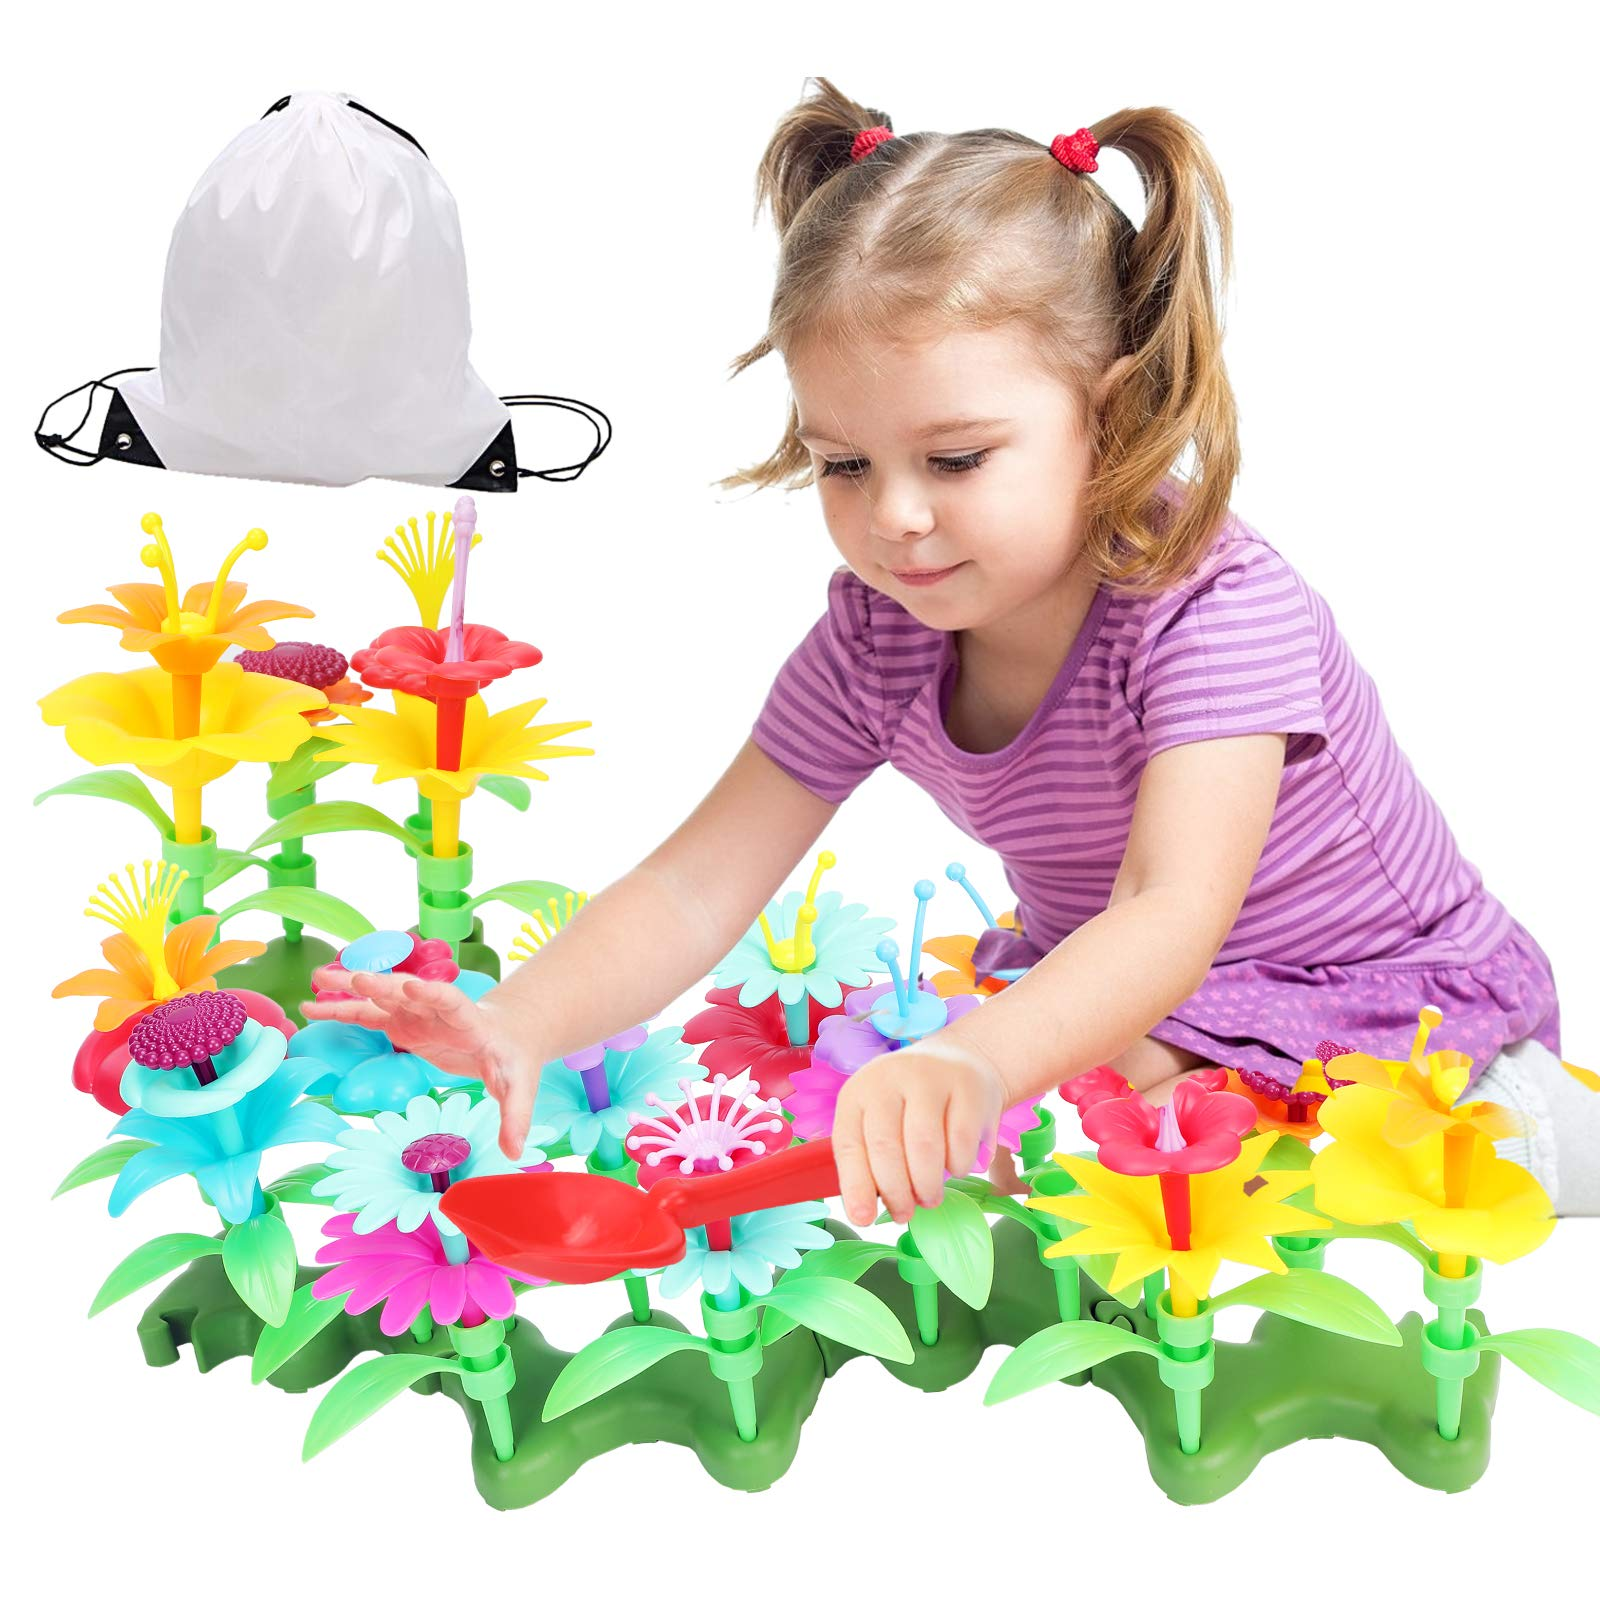 Jogotoll Flower Garden Building Toys138 PCS Gardening Pretend Set Gifts for 3-6